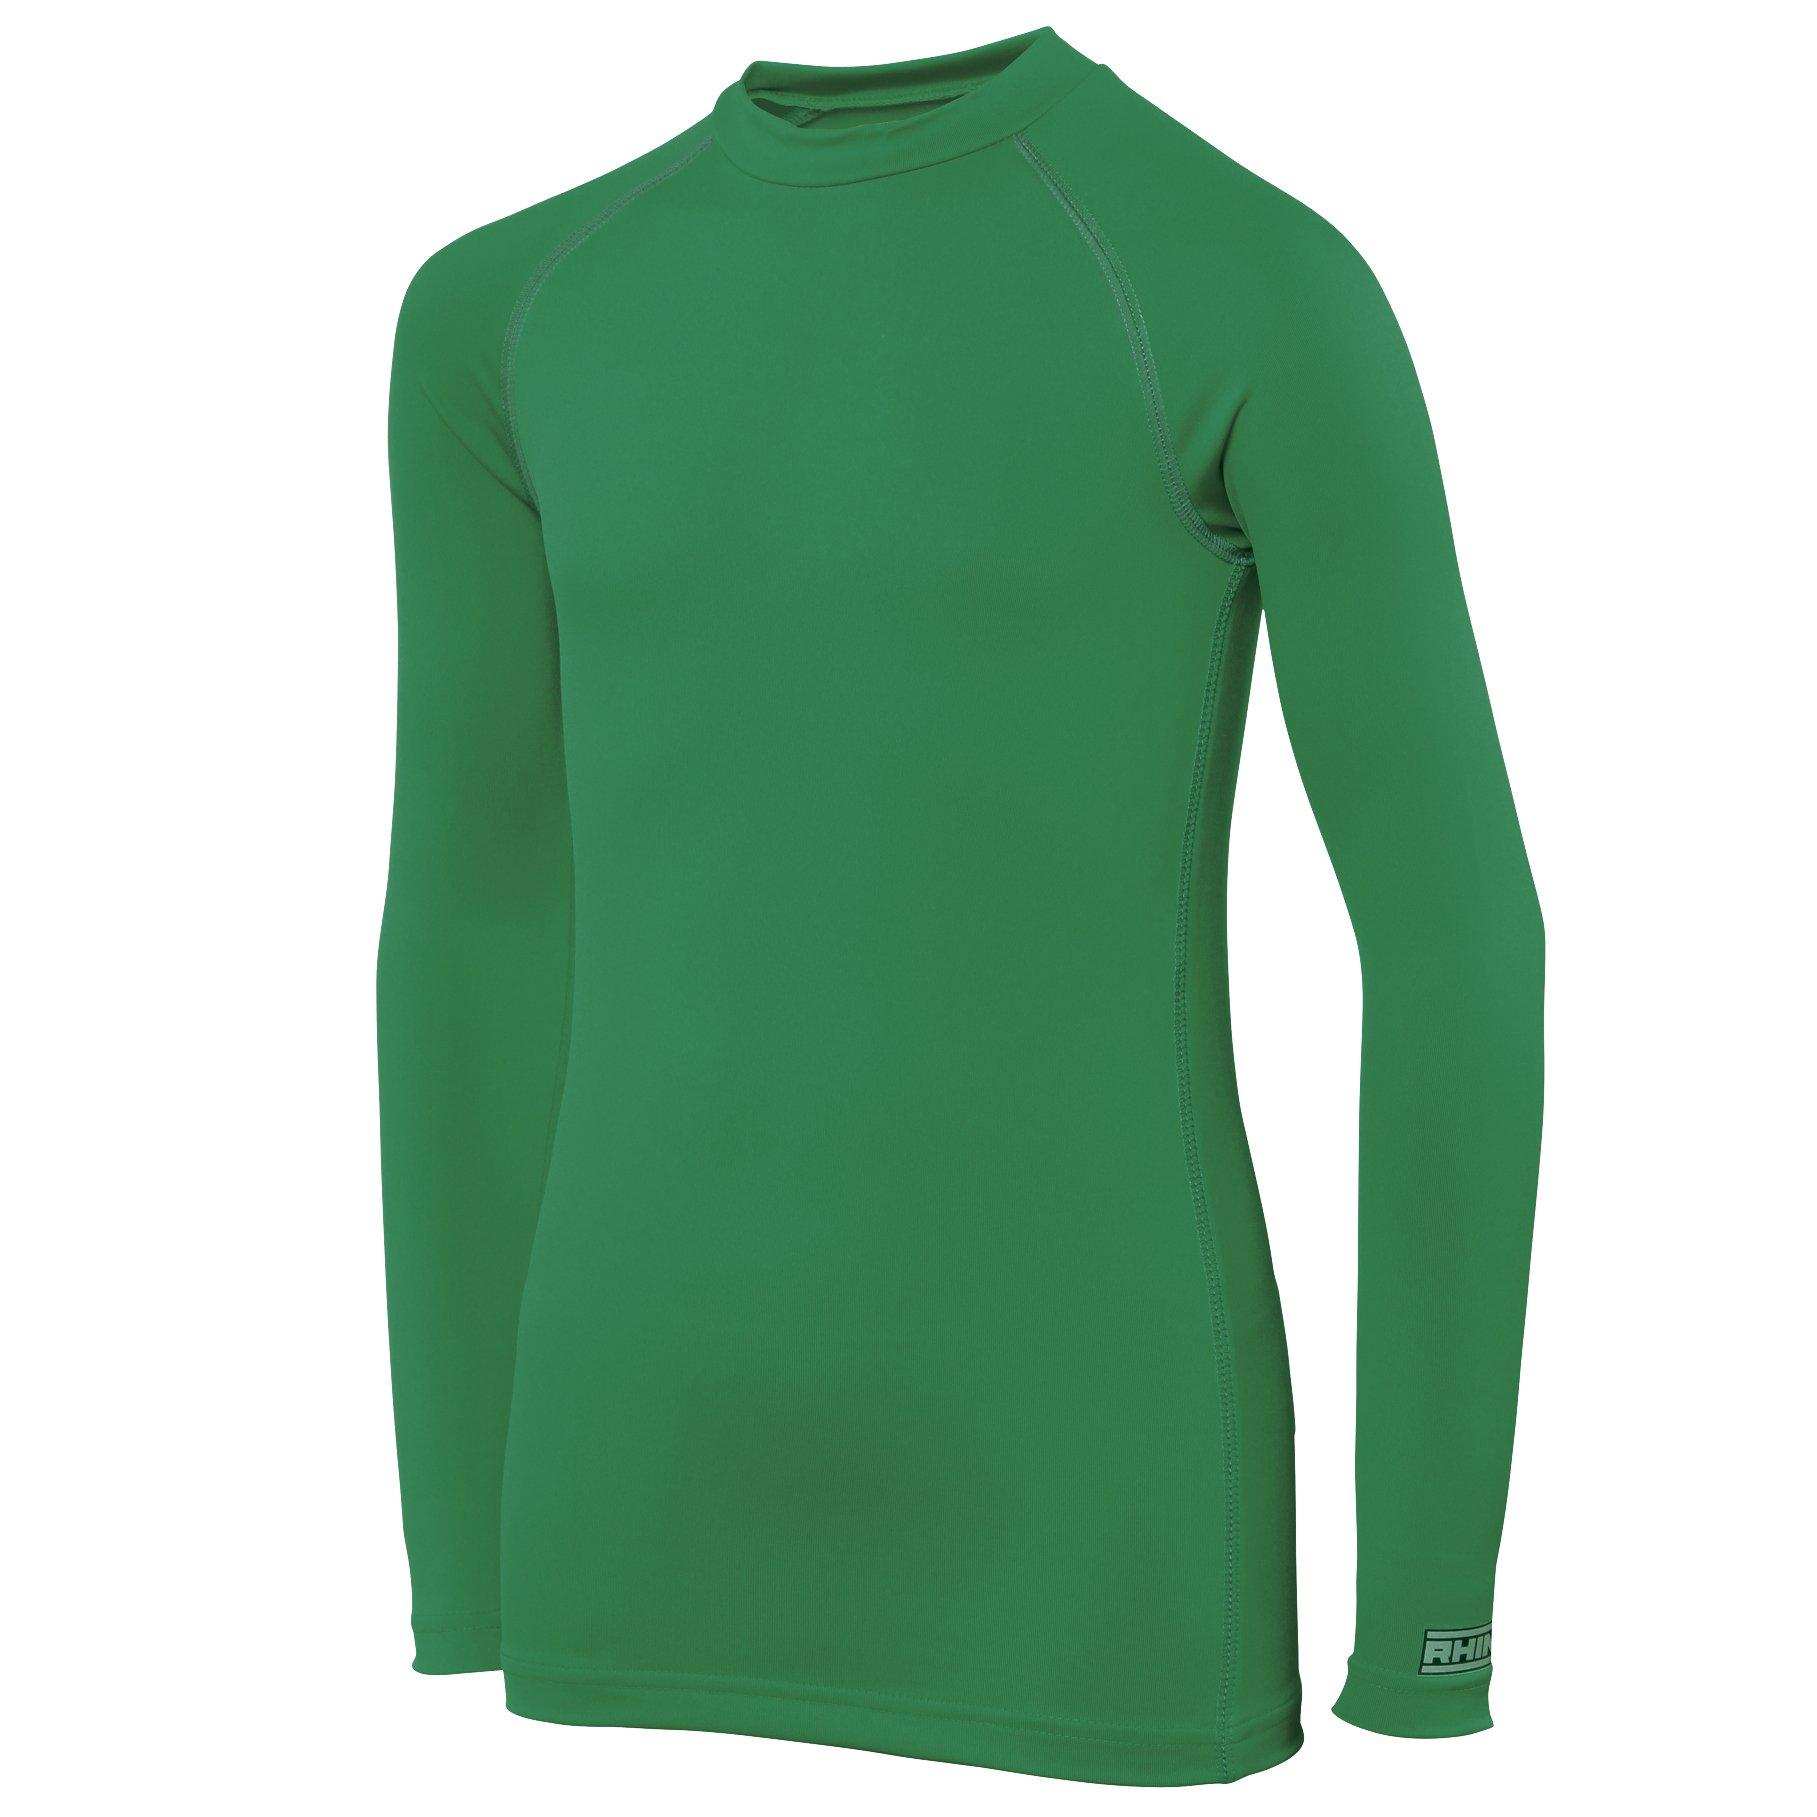 Rhino Childrens Big Boys Long Sleeve Thermal Underwear Base Layer Vest Top (5-6) (Green) by Rhino